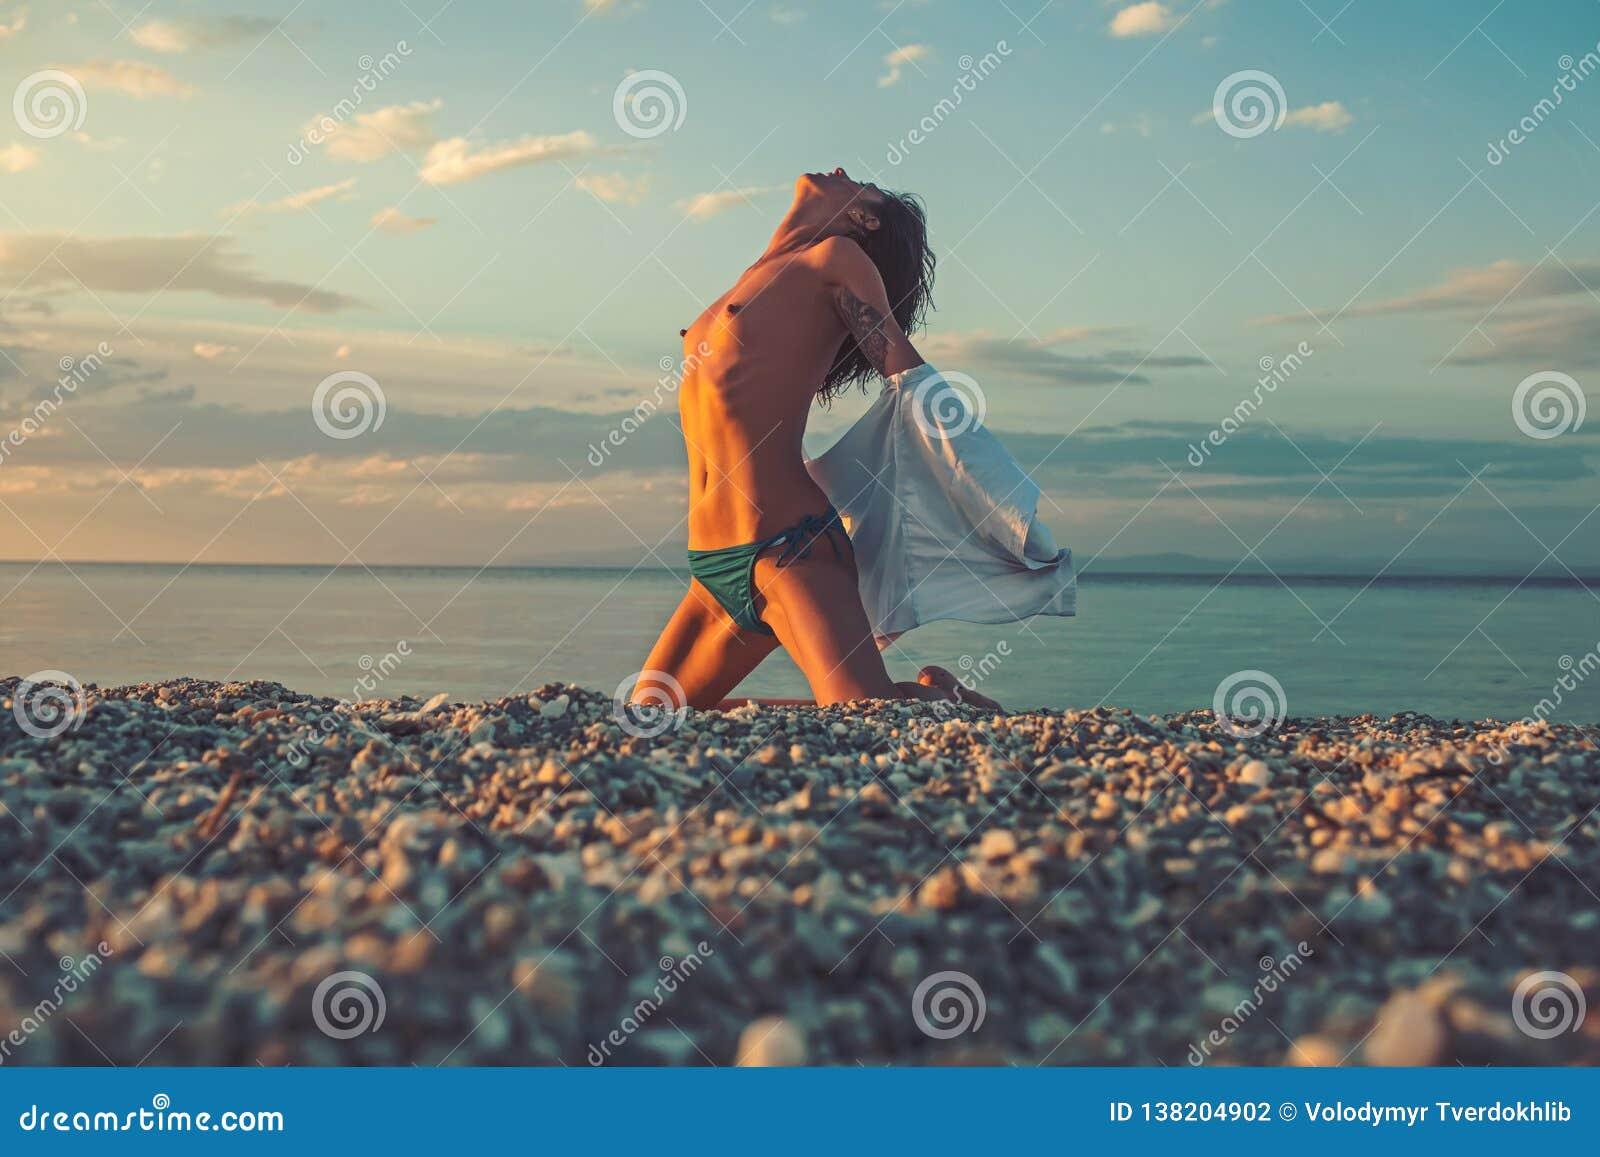 Girls beach naked Nude Beach